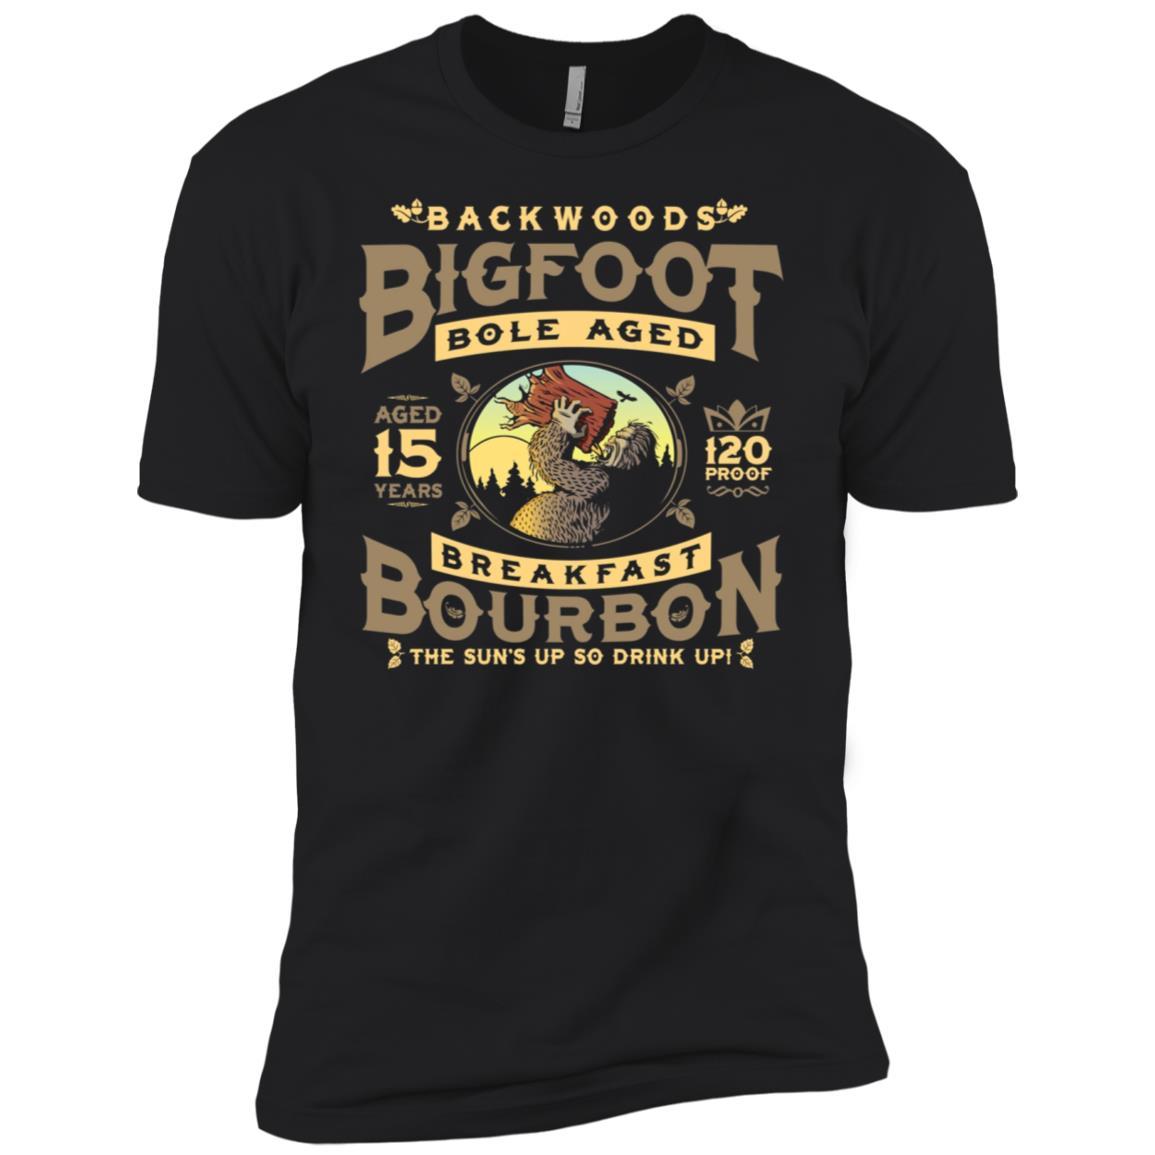 Backwoods Bigfoot Bole Aged Breakfast Bourbon Men Short Sleeve T-Shirt